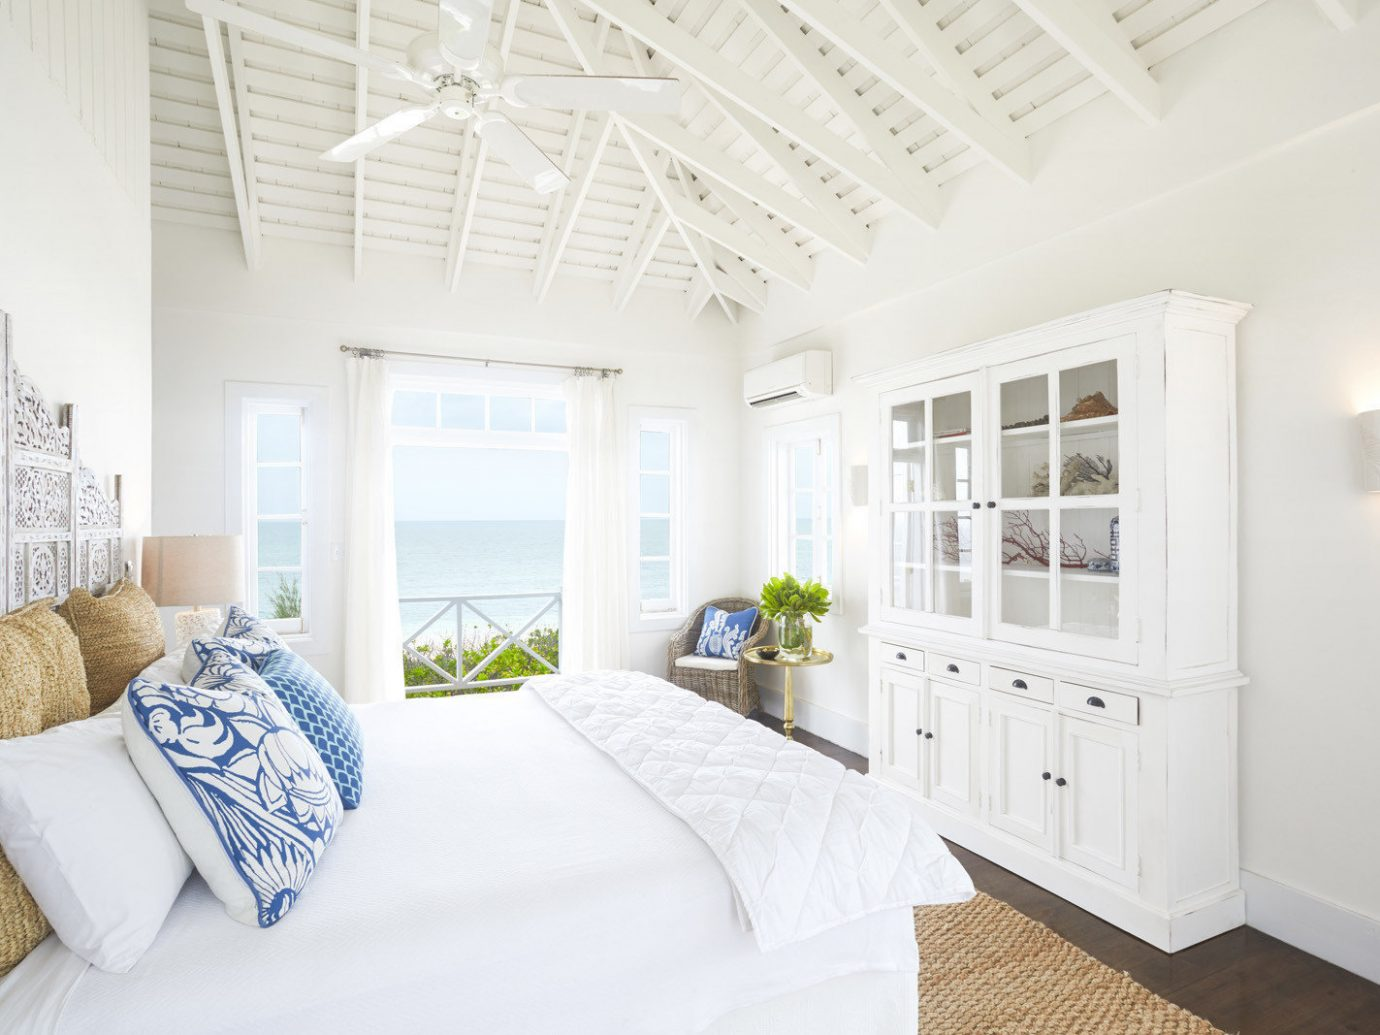 Bedroom at Kamalame Cay in the Bahamas